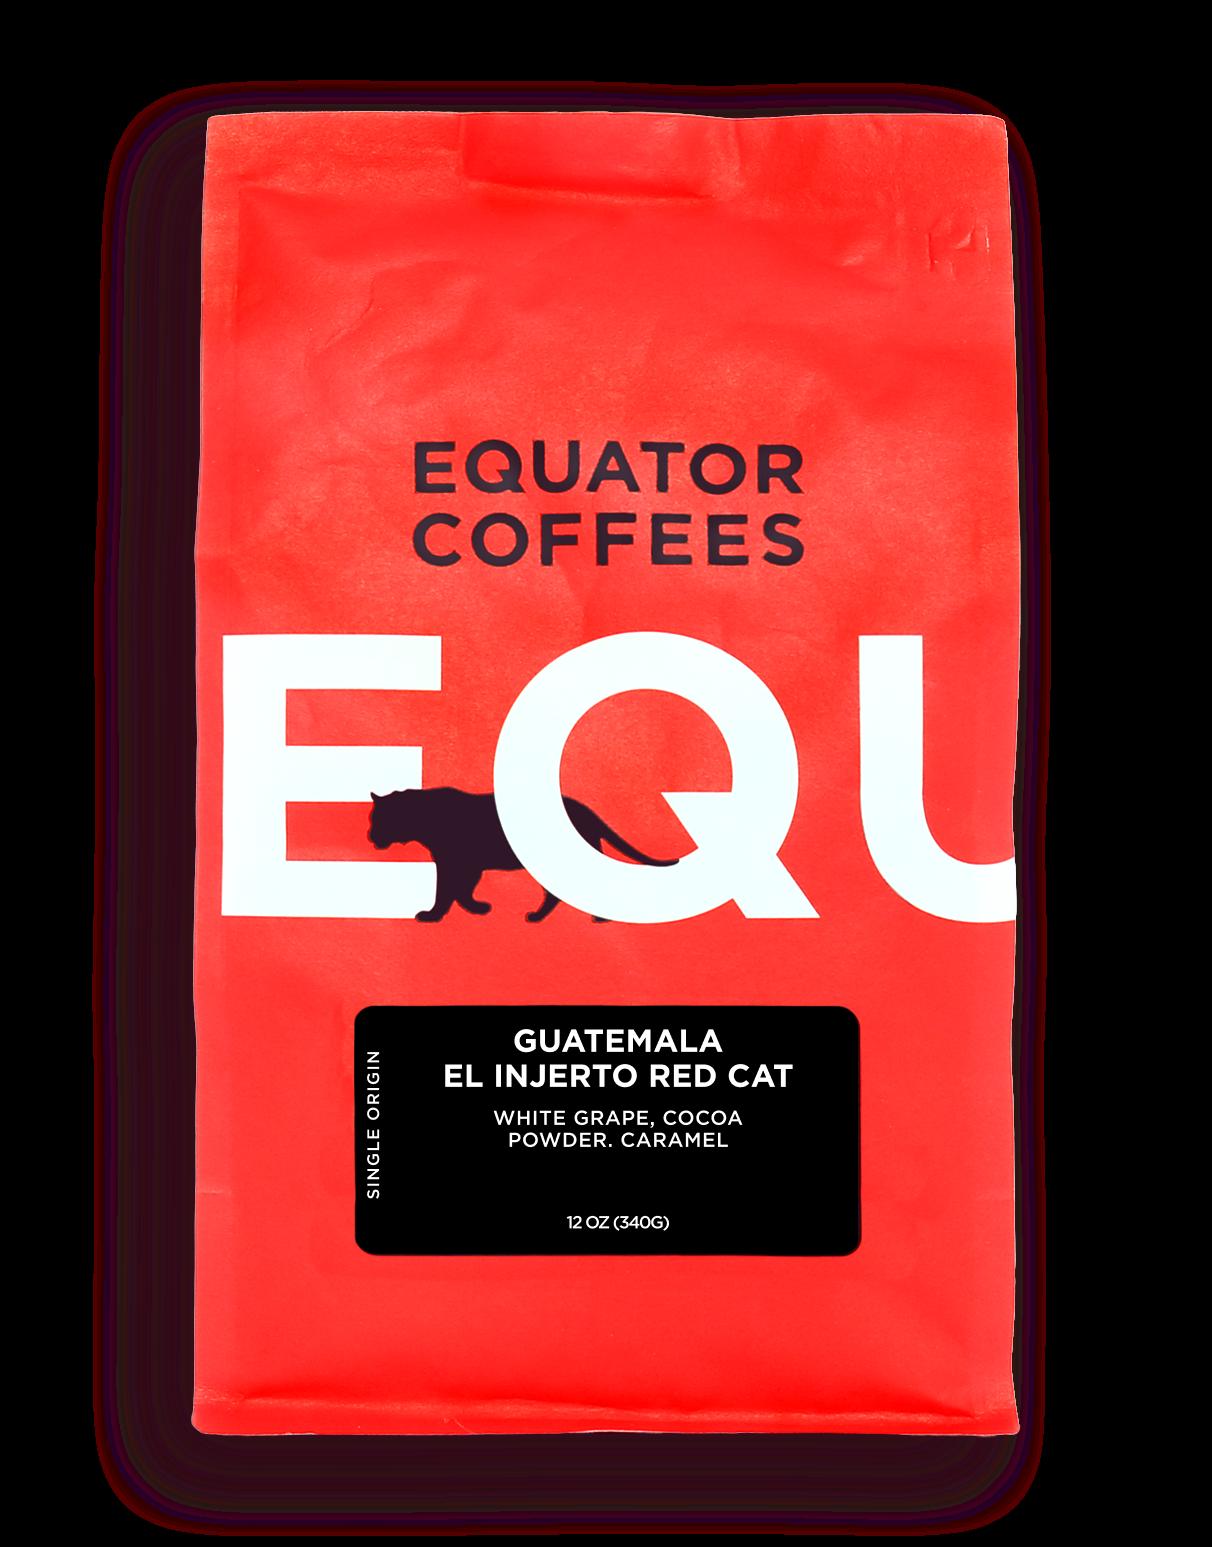 Guatemala El Injerto Red Cat